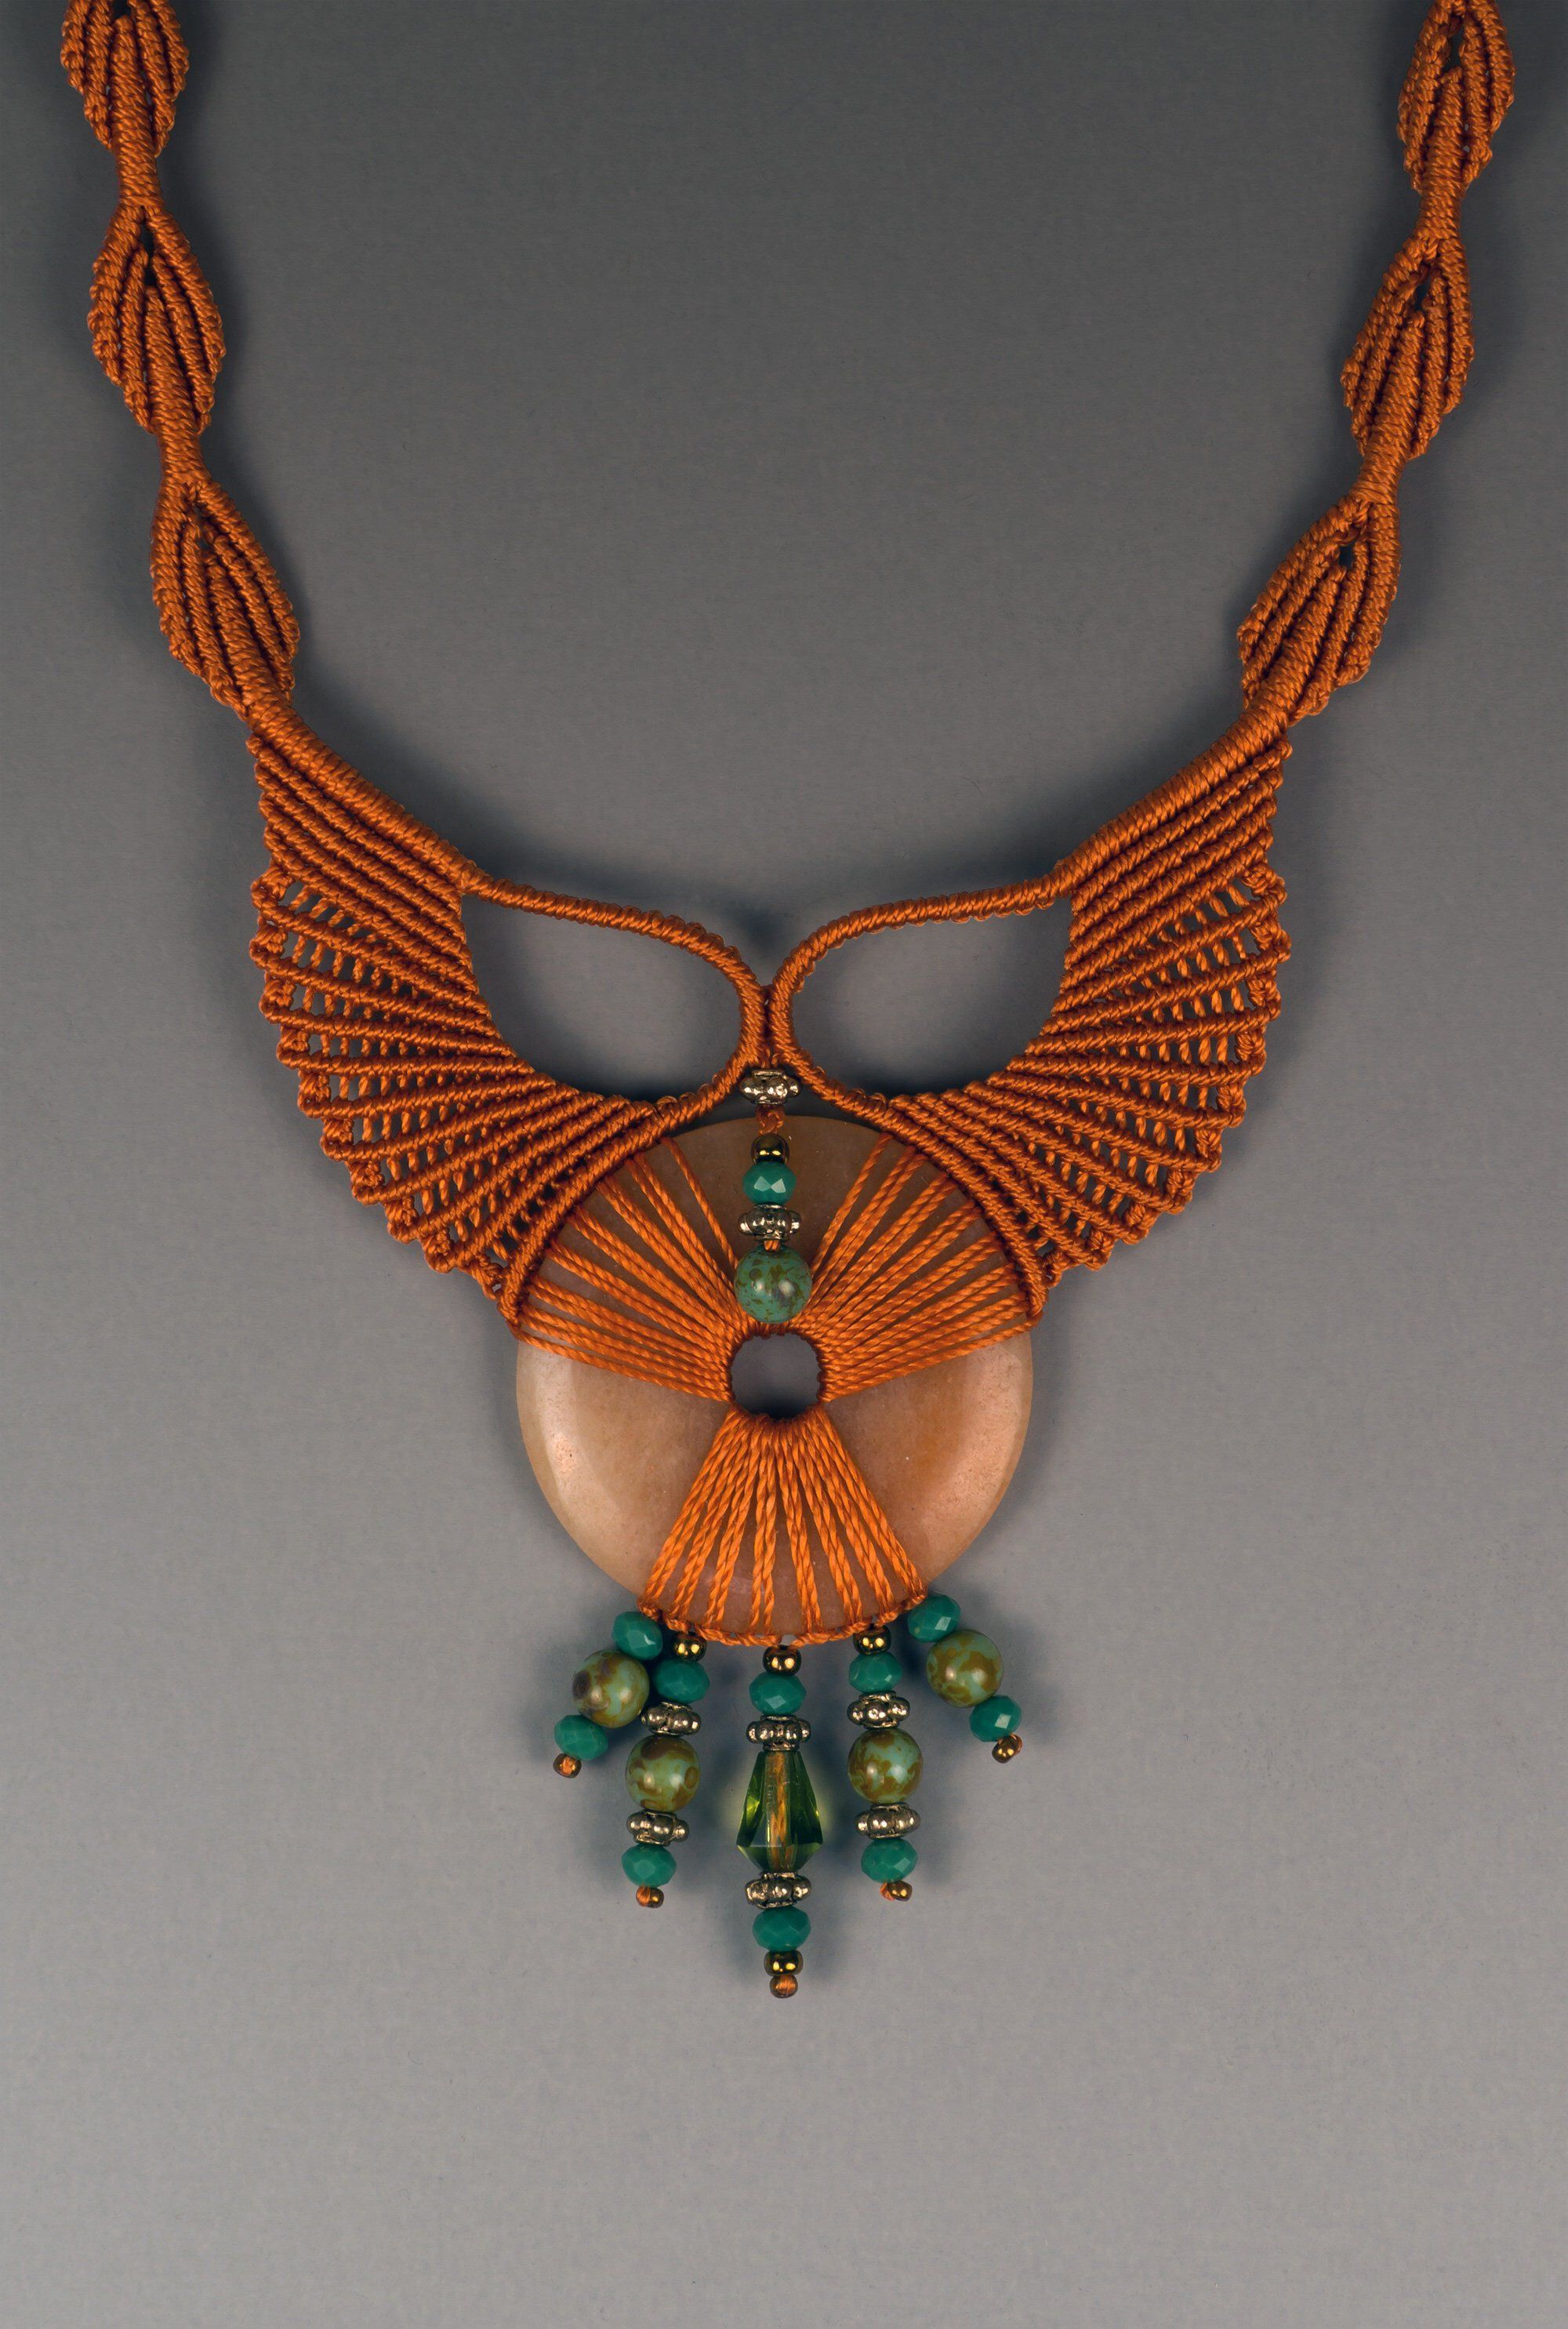 Ivory Statement Necklace Tassel Necklace Festival Macrame Jewelry Fringe Necklace Tribal Ethnic Necklace